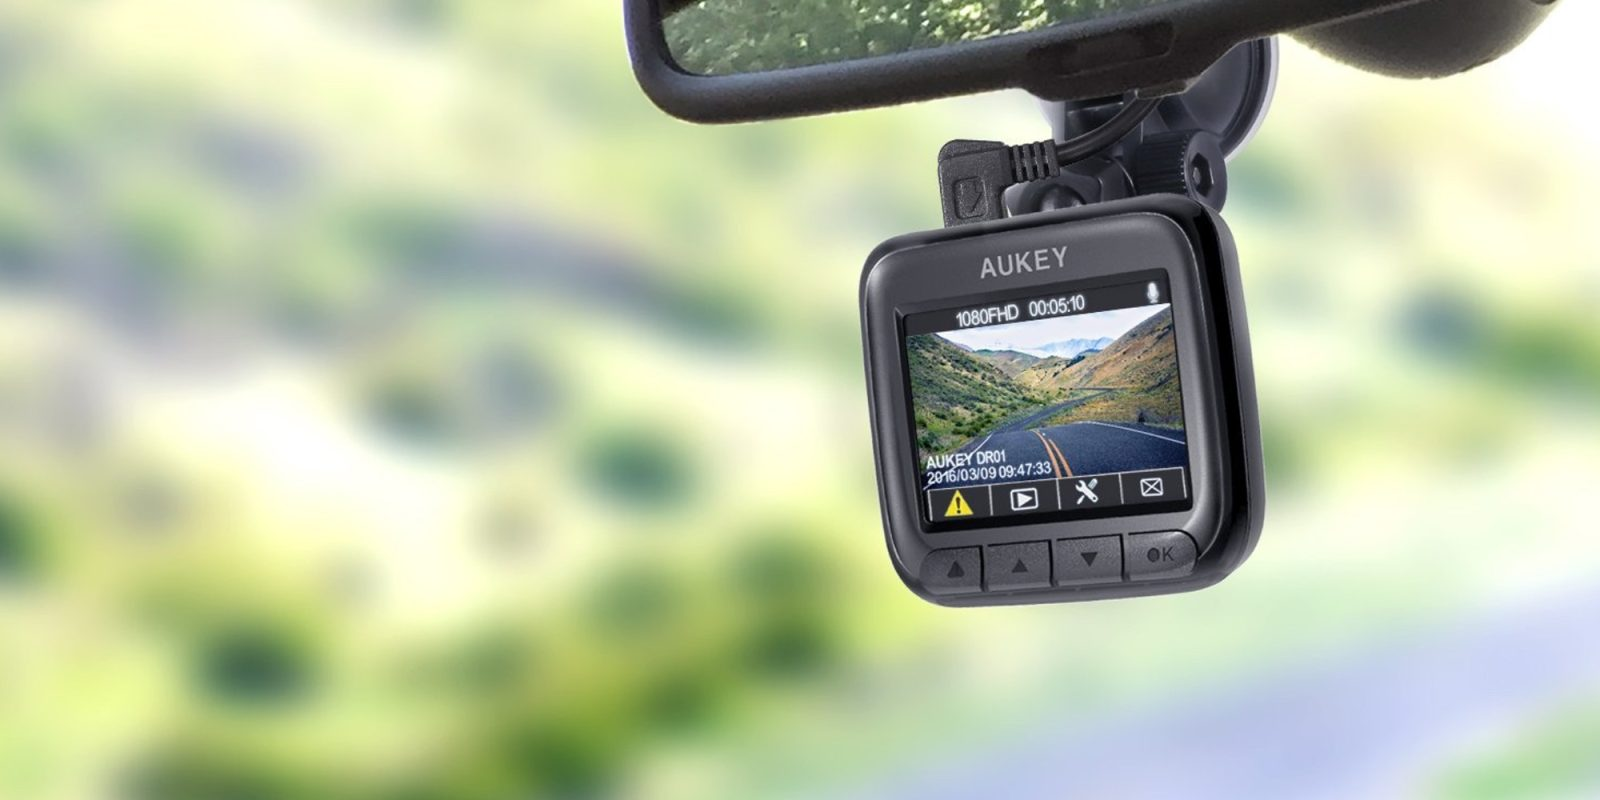 Aukey 1080p Dash Cam w/ Night vision for $50 shipped (Reg. $70)